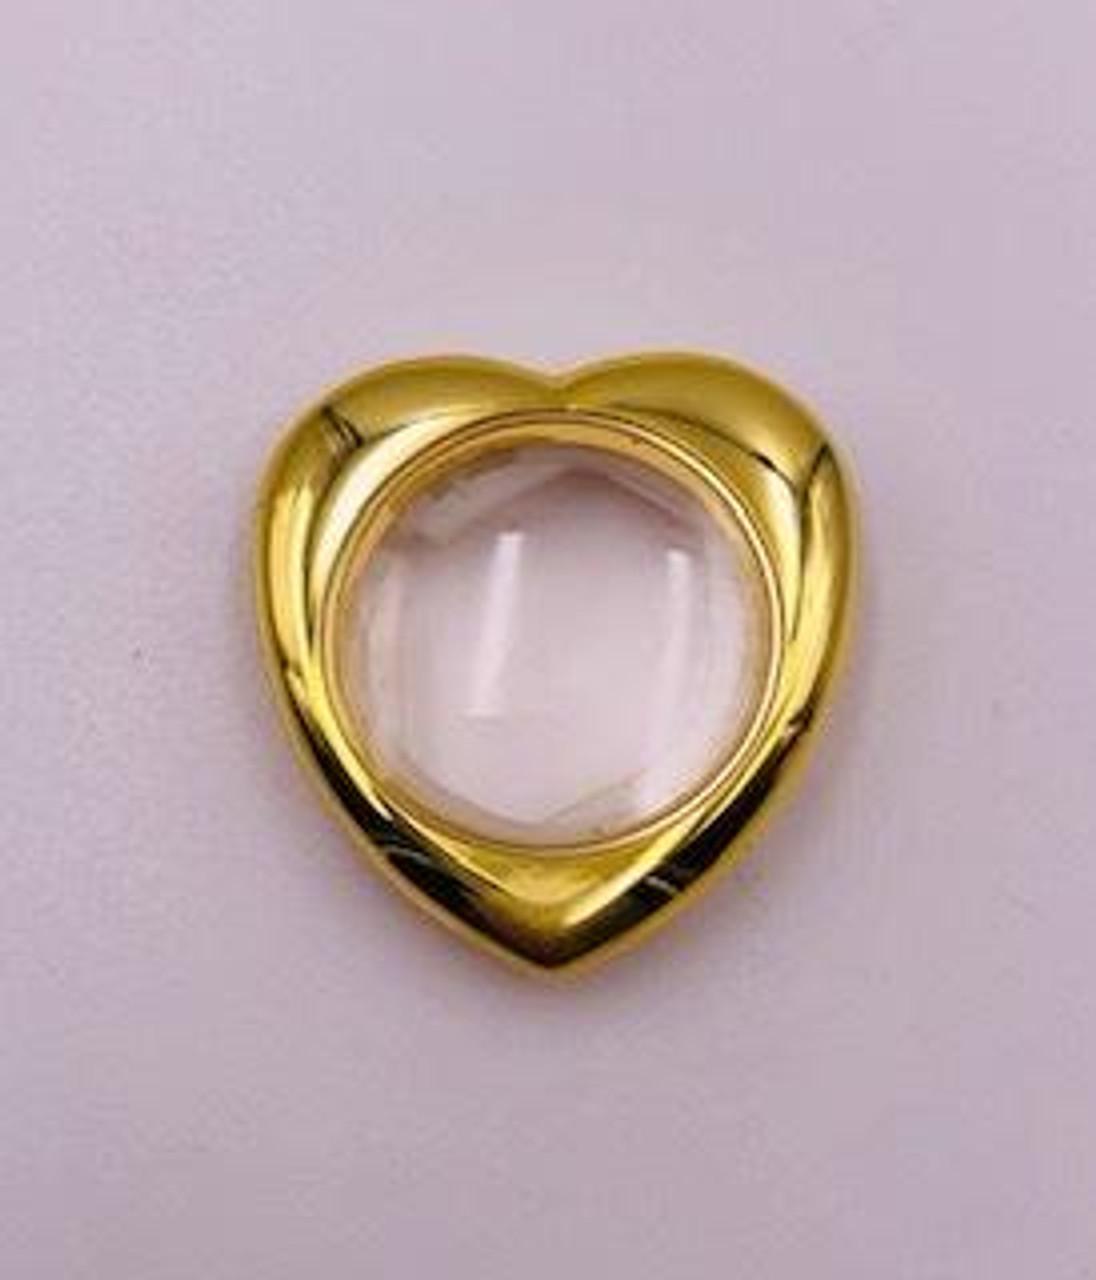 Heart Photo Frame Inserts